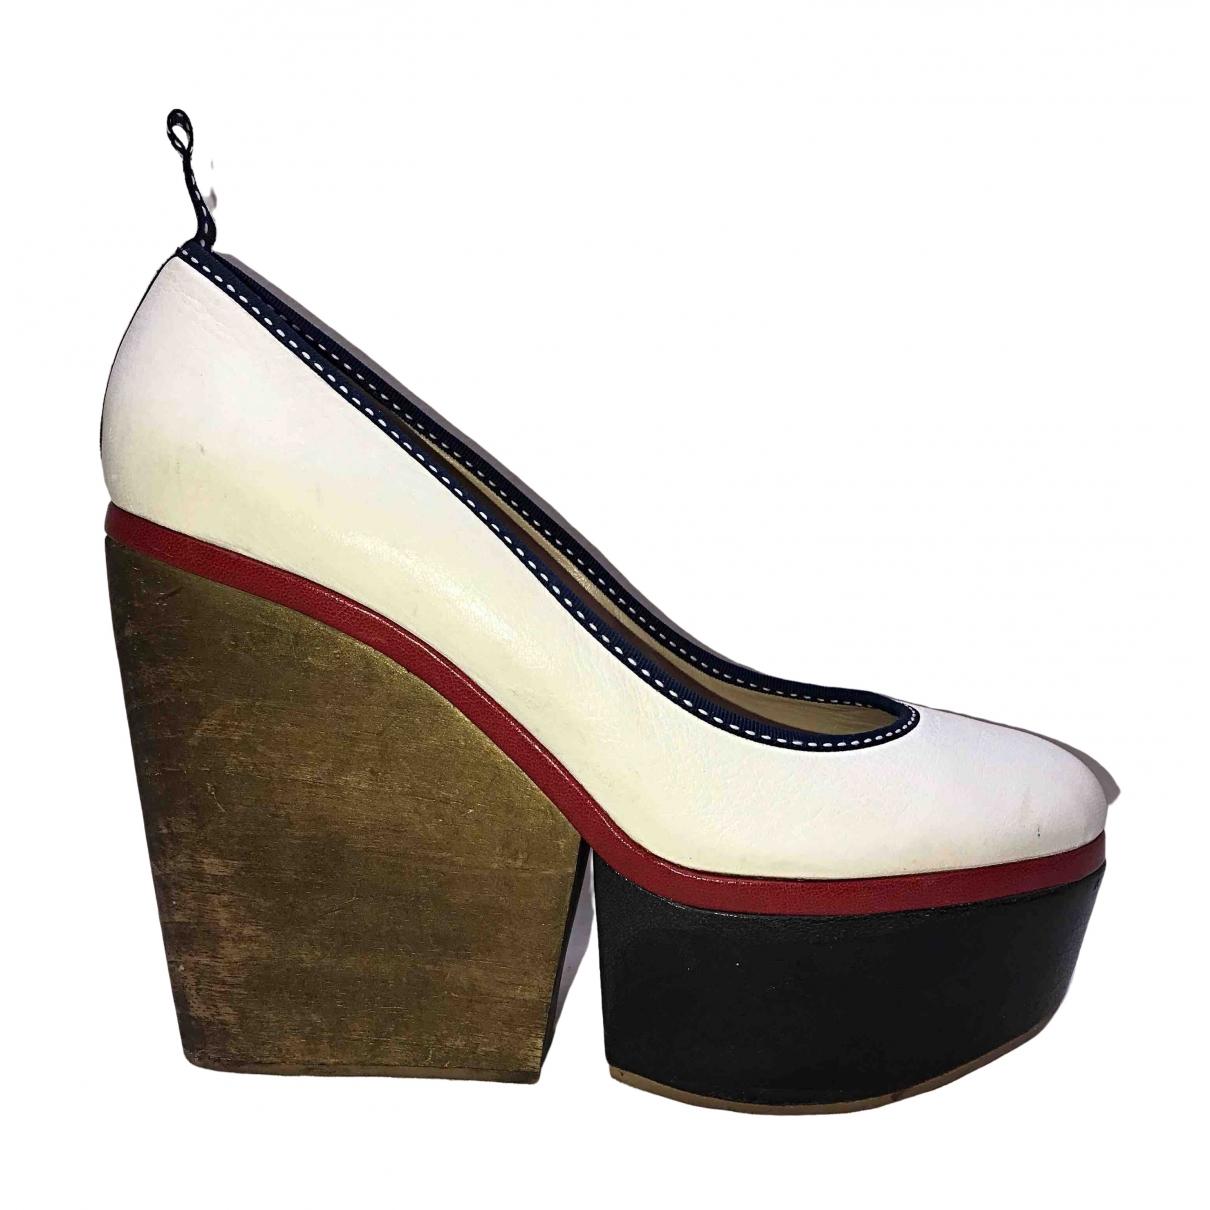 Dolce & Gabbana \N Clogs in  Weiss Leder